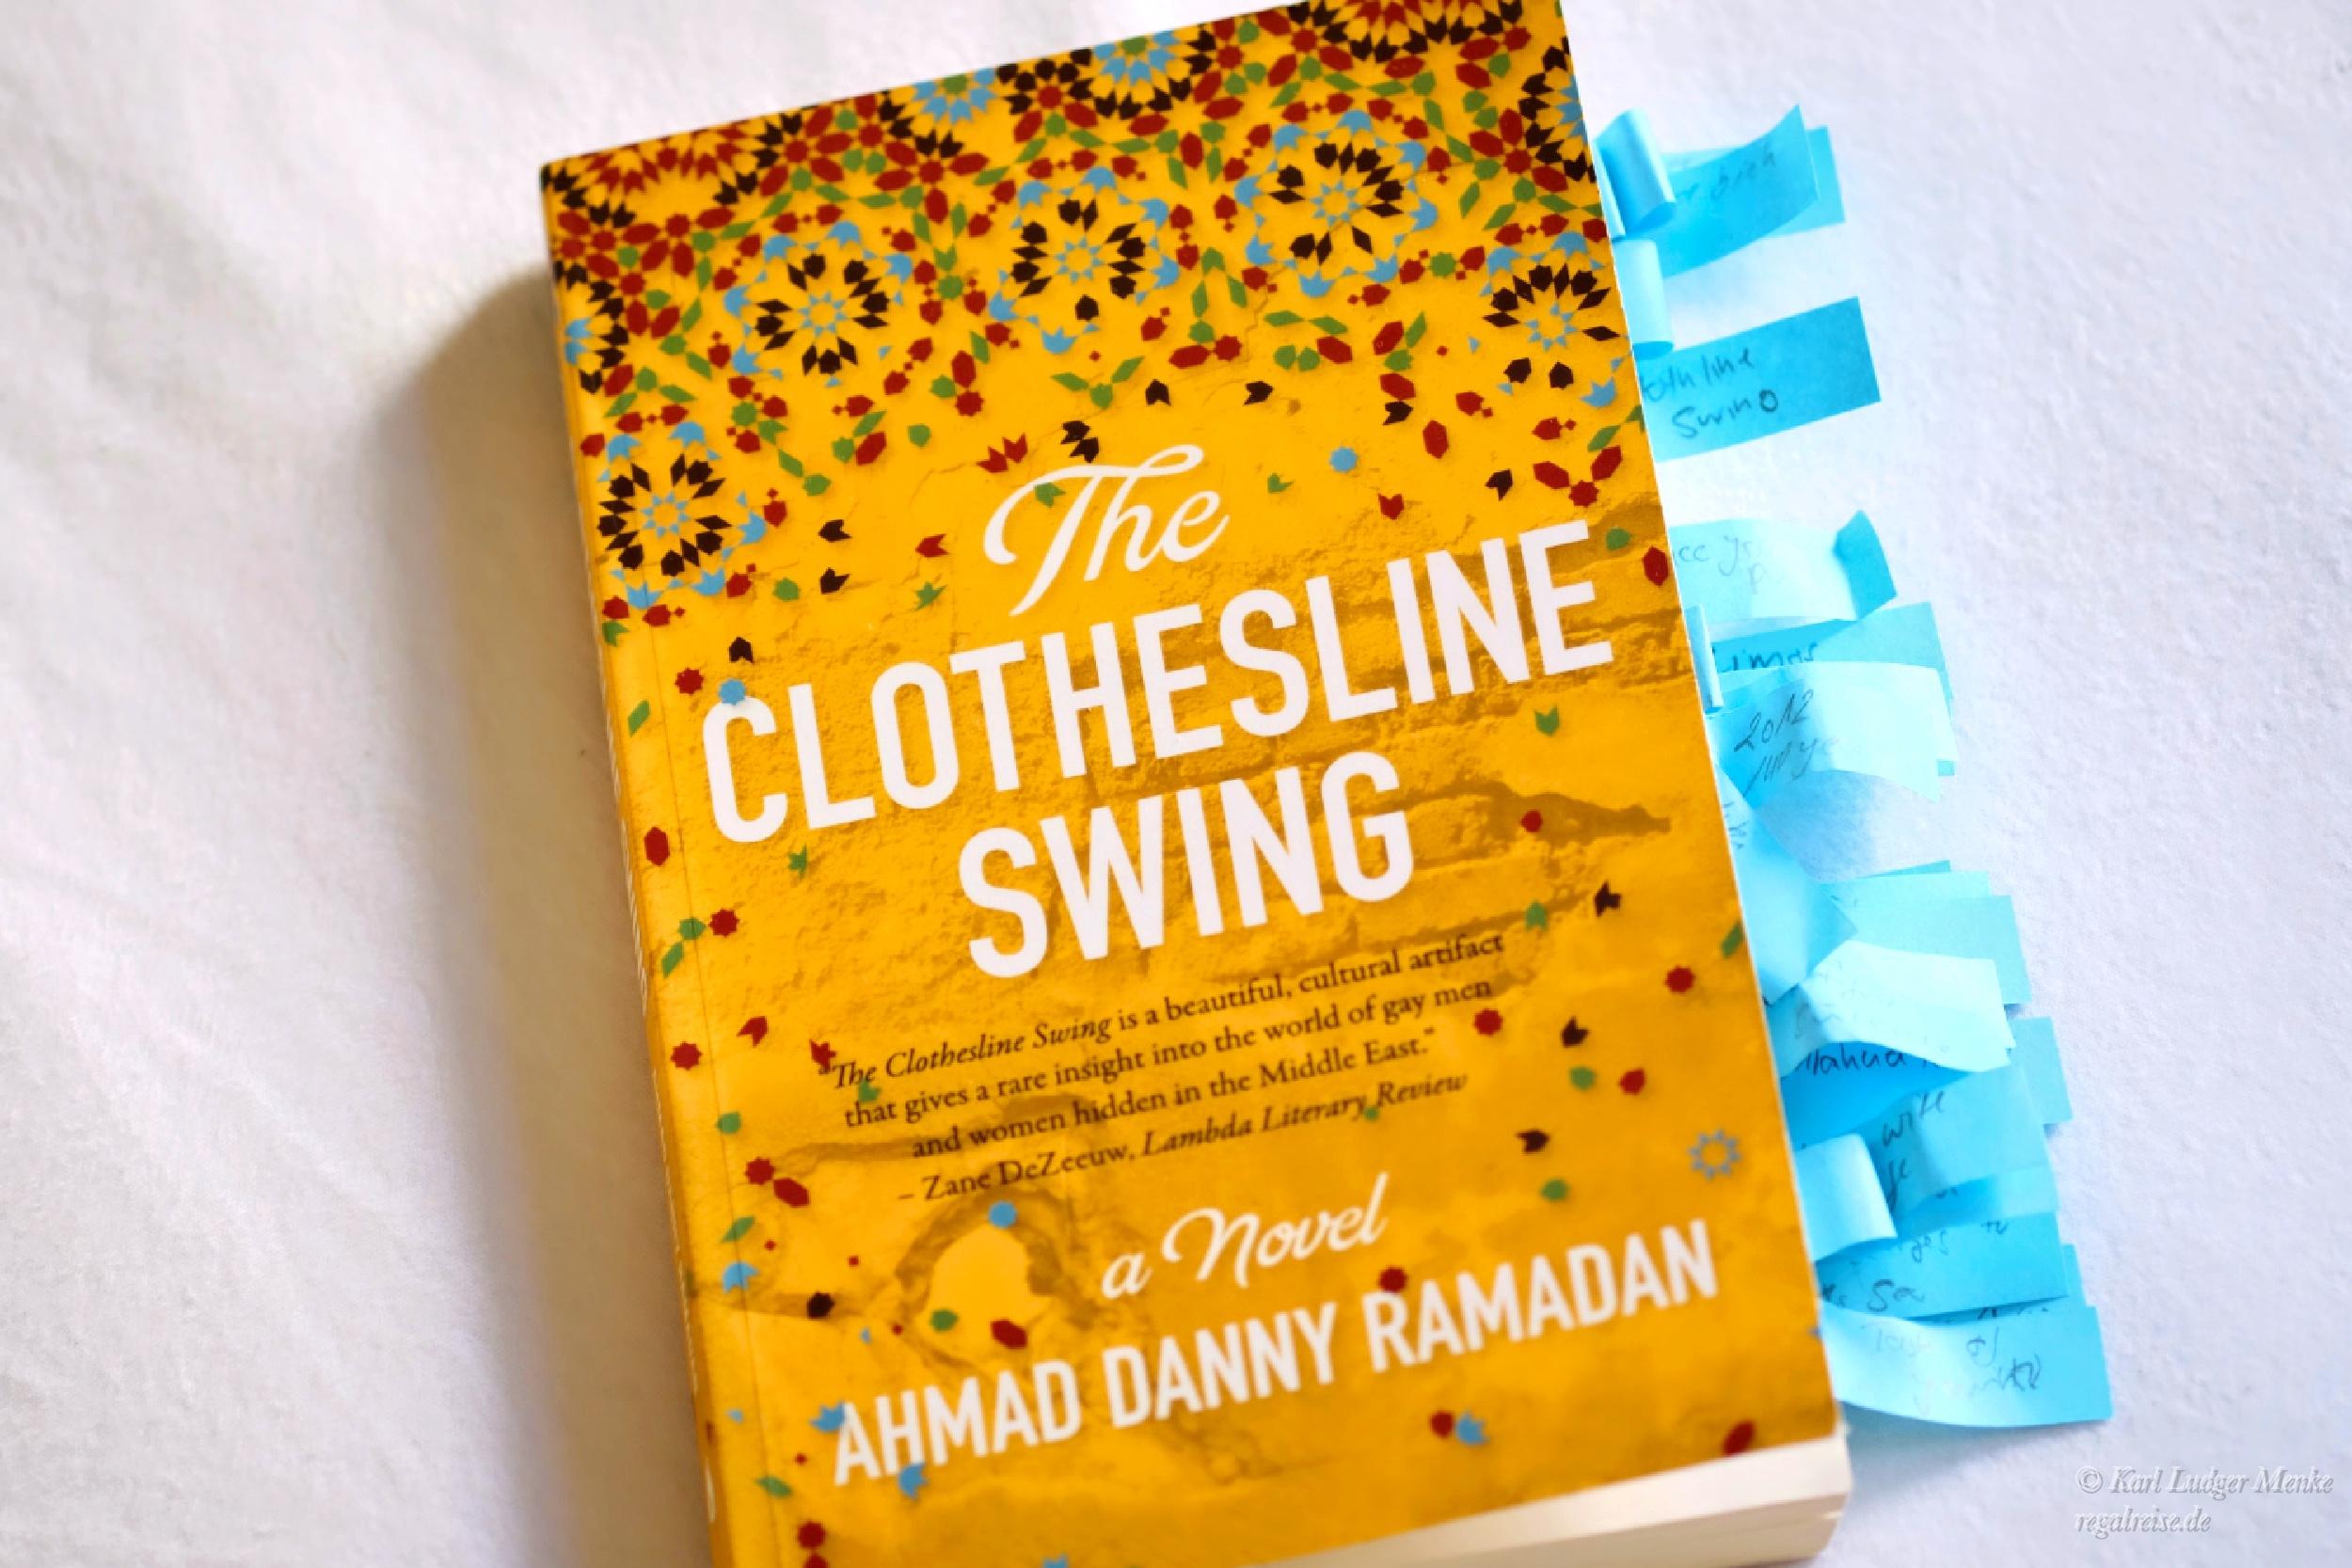 Ahmad Danny Ramadan The Clothesline Swing